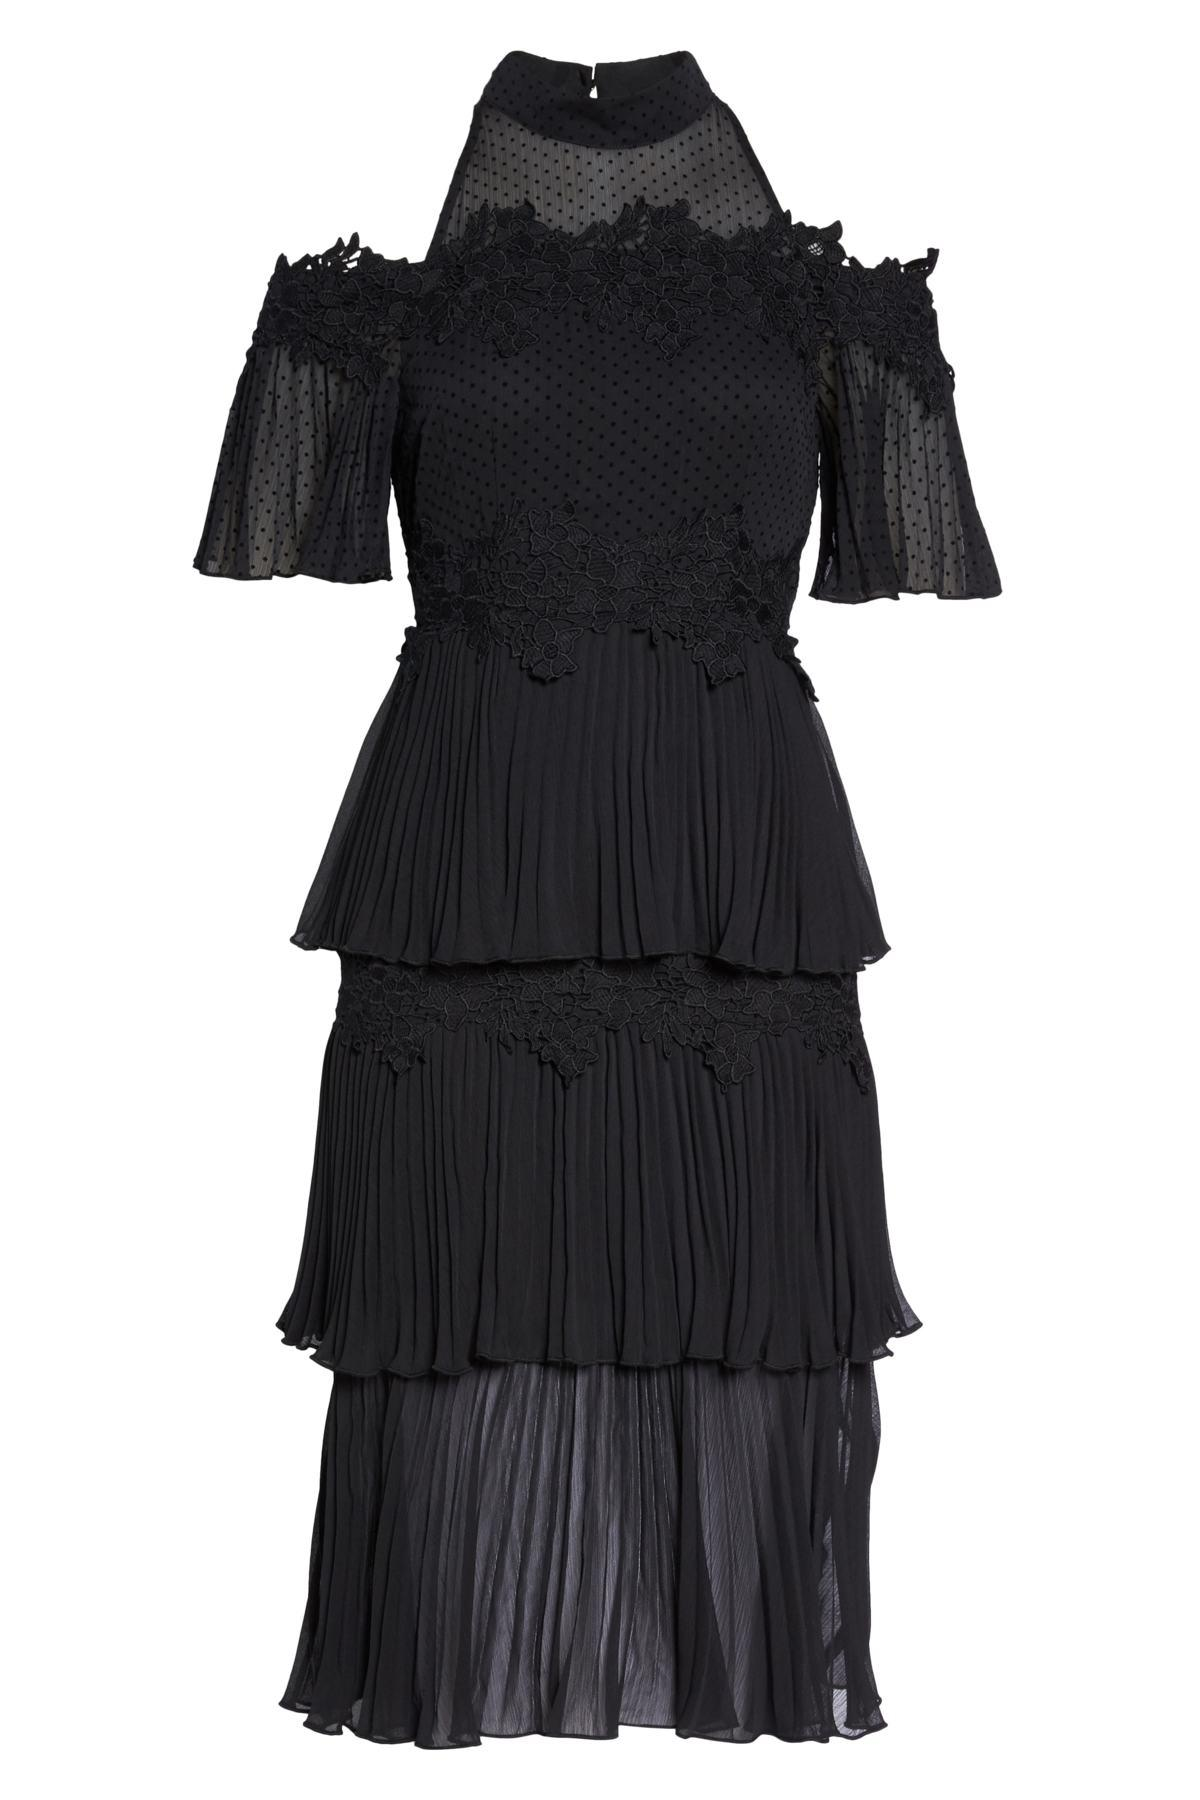 c37f10938e05 Keepsake Horizons Cold Shoulder Dress in Black - Lyst